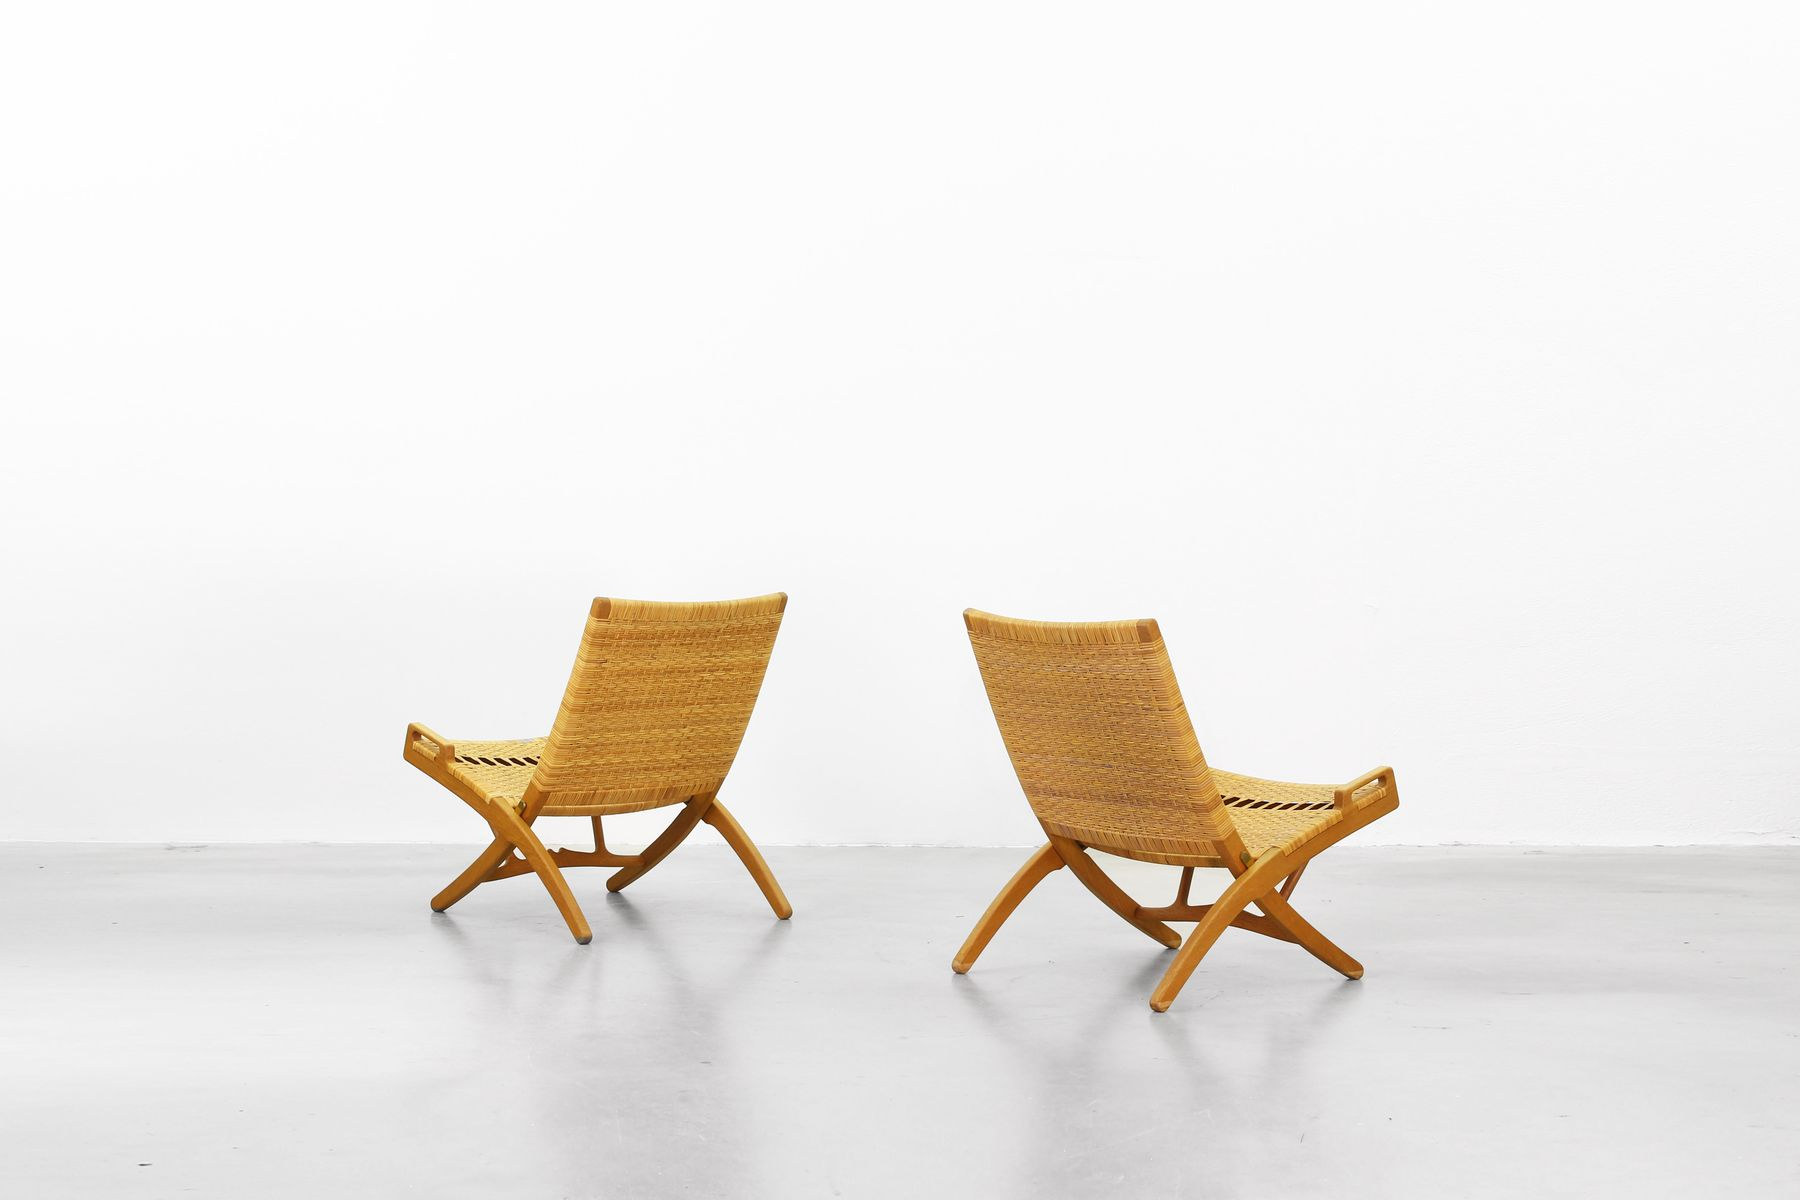 klappbare mid century sessel von hans j wegner f r. Black Bedroom Furniture Sets. Home Design Ideas